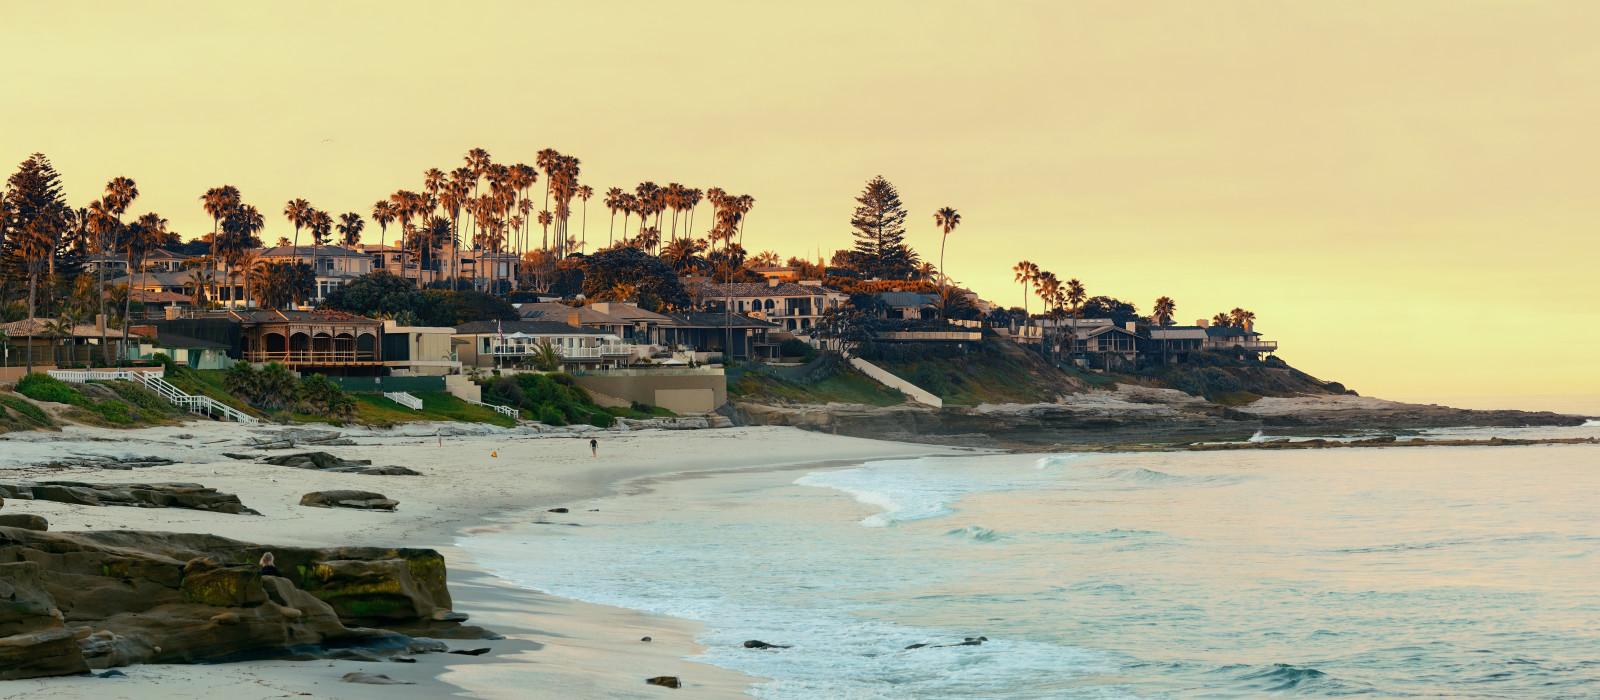 Destination San Diego USA